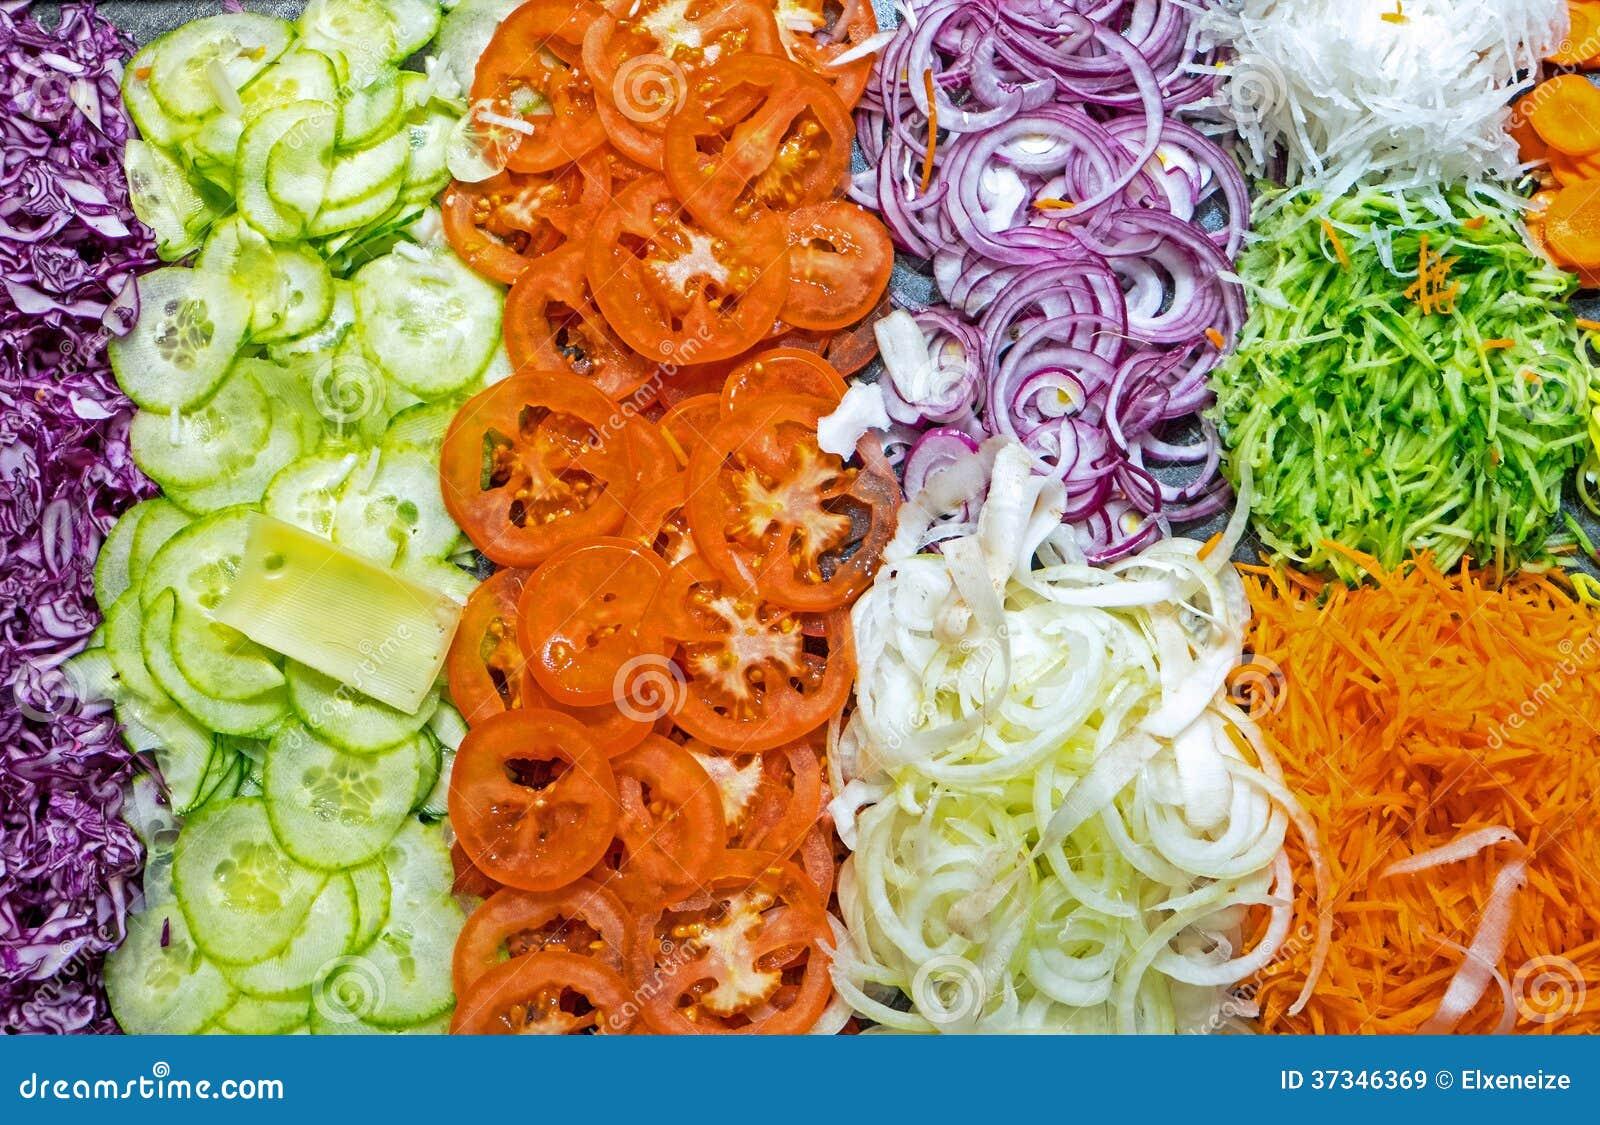 Färgglad salladbuffé